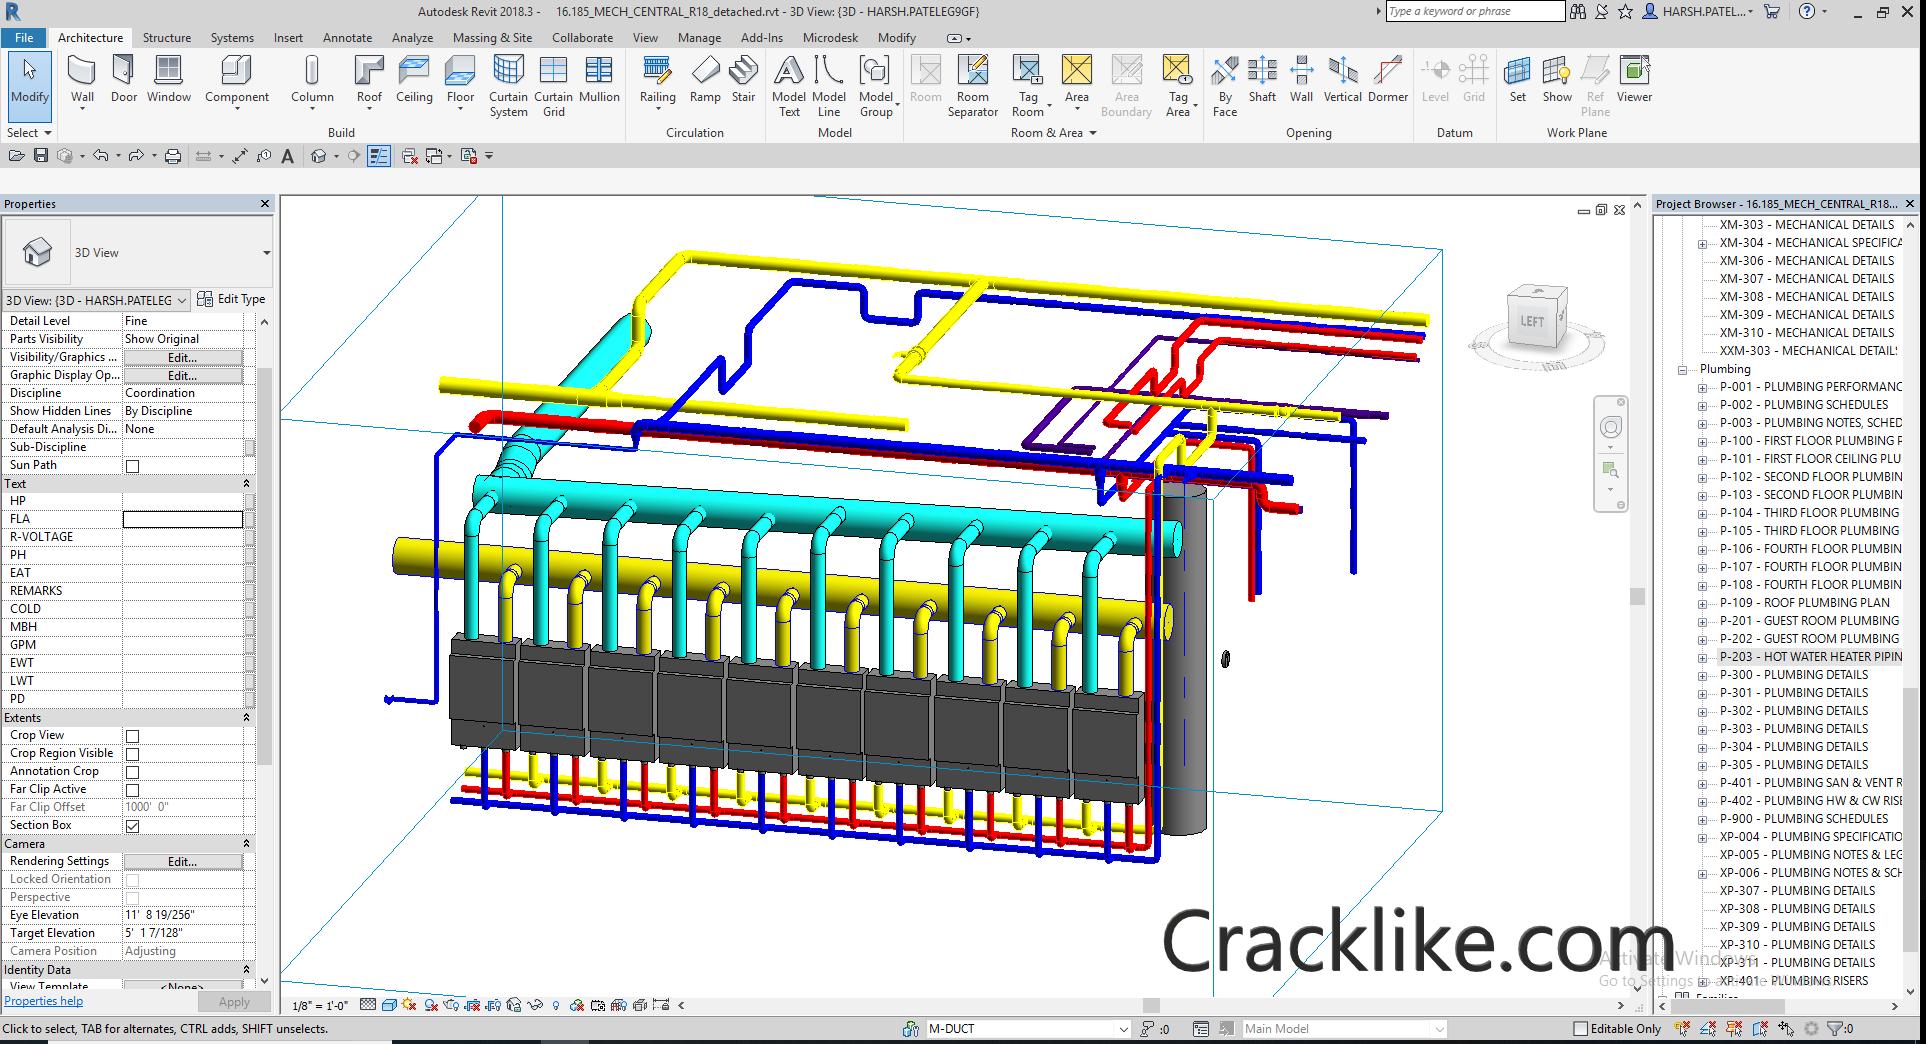 Autodesk Revit 2022 Crack + Serial Keygen Free Download